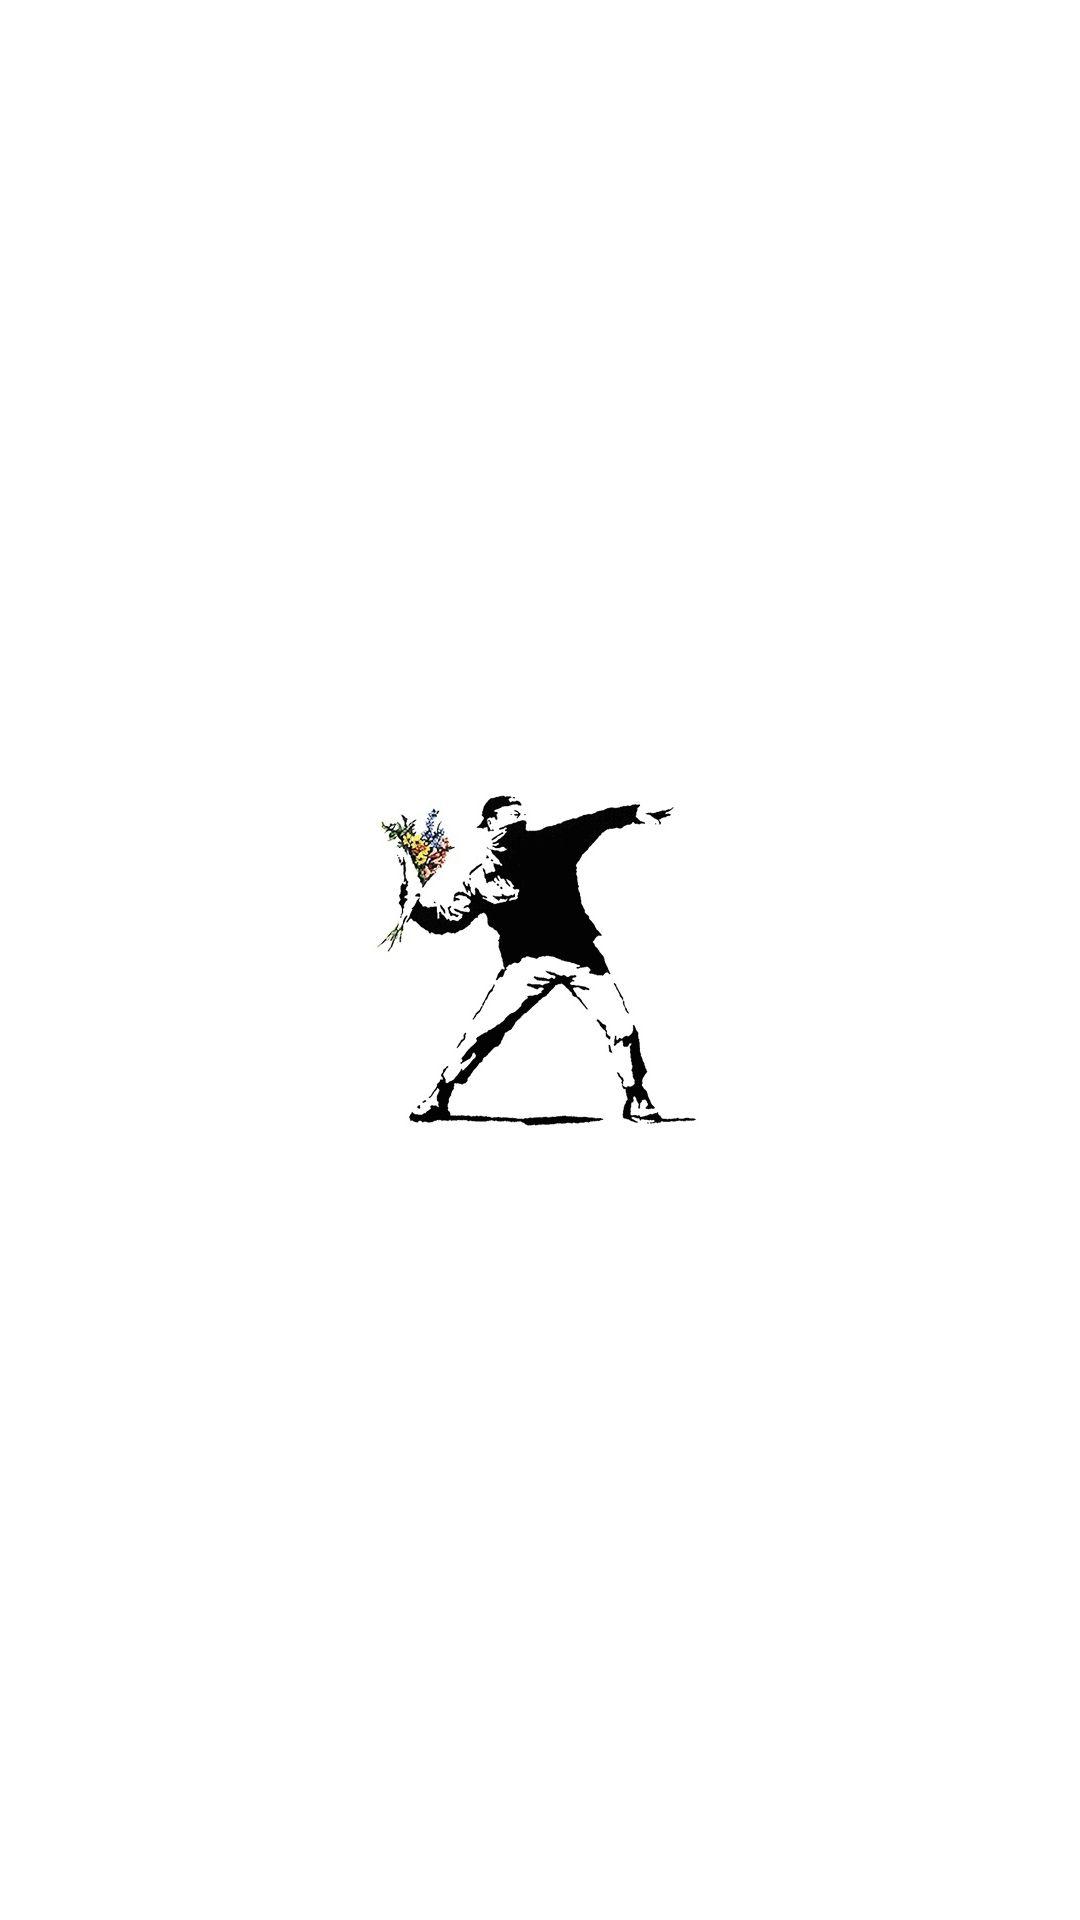 Banksy 画像あり バンクシー Banksyのグラフィティ バンクシー